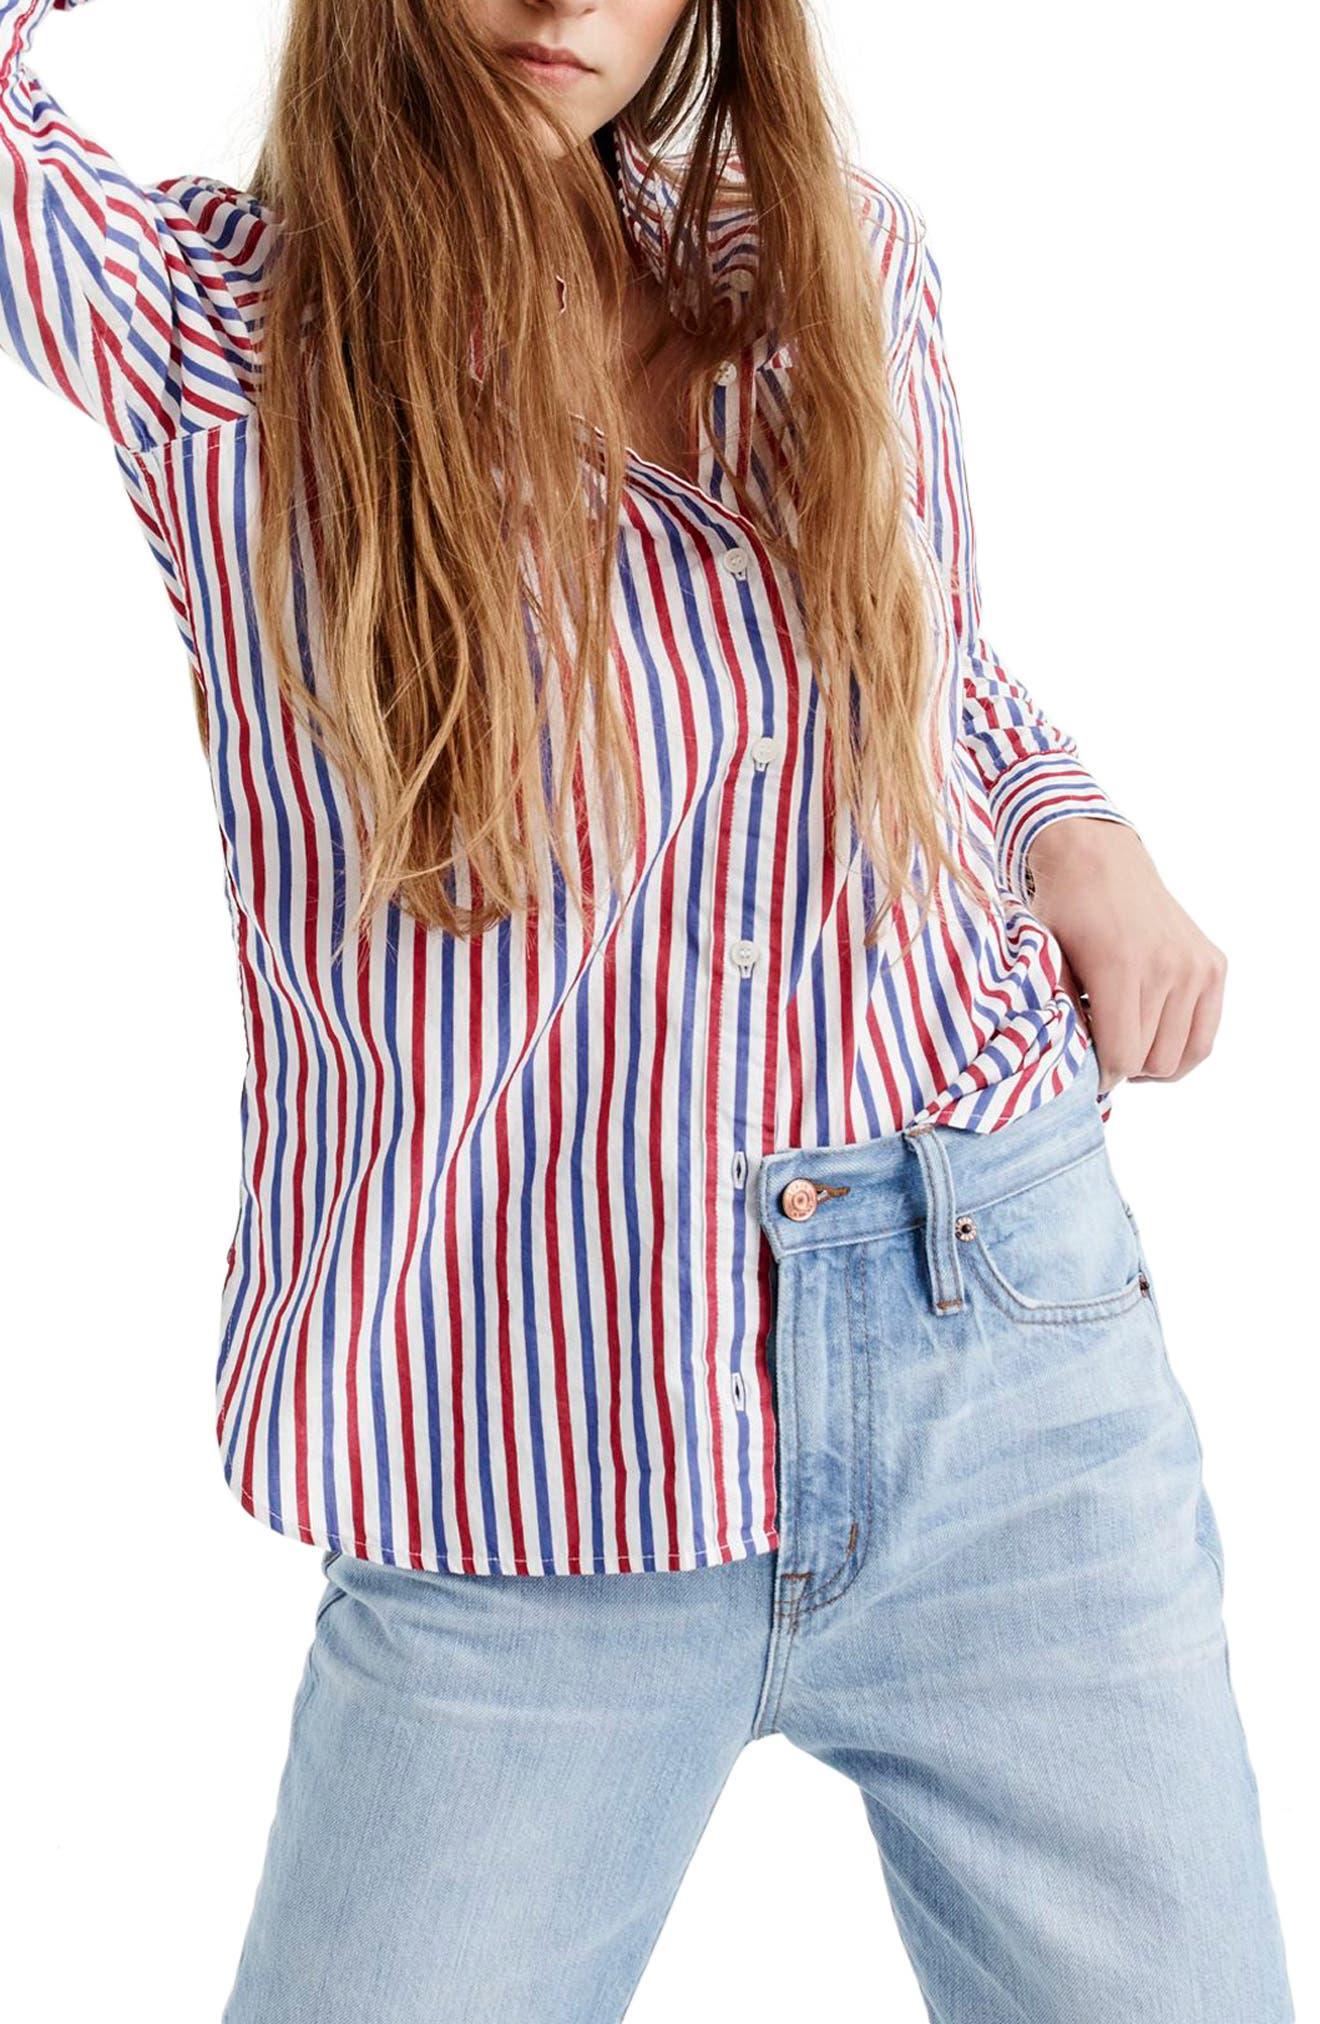 Main Image - J. Crew Stripe Boyfriend Shirt